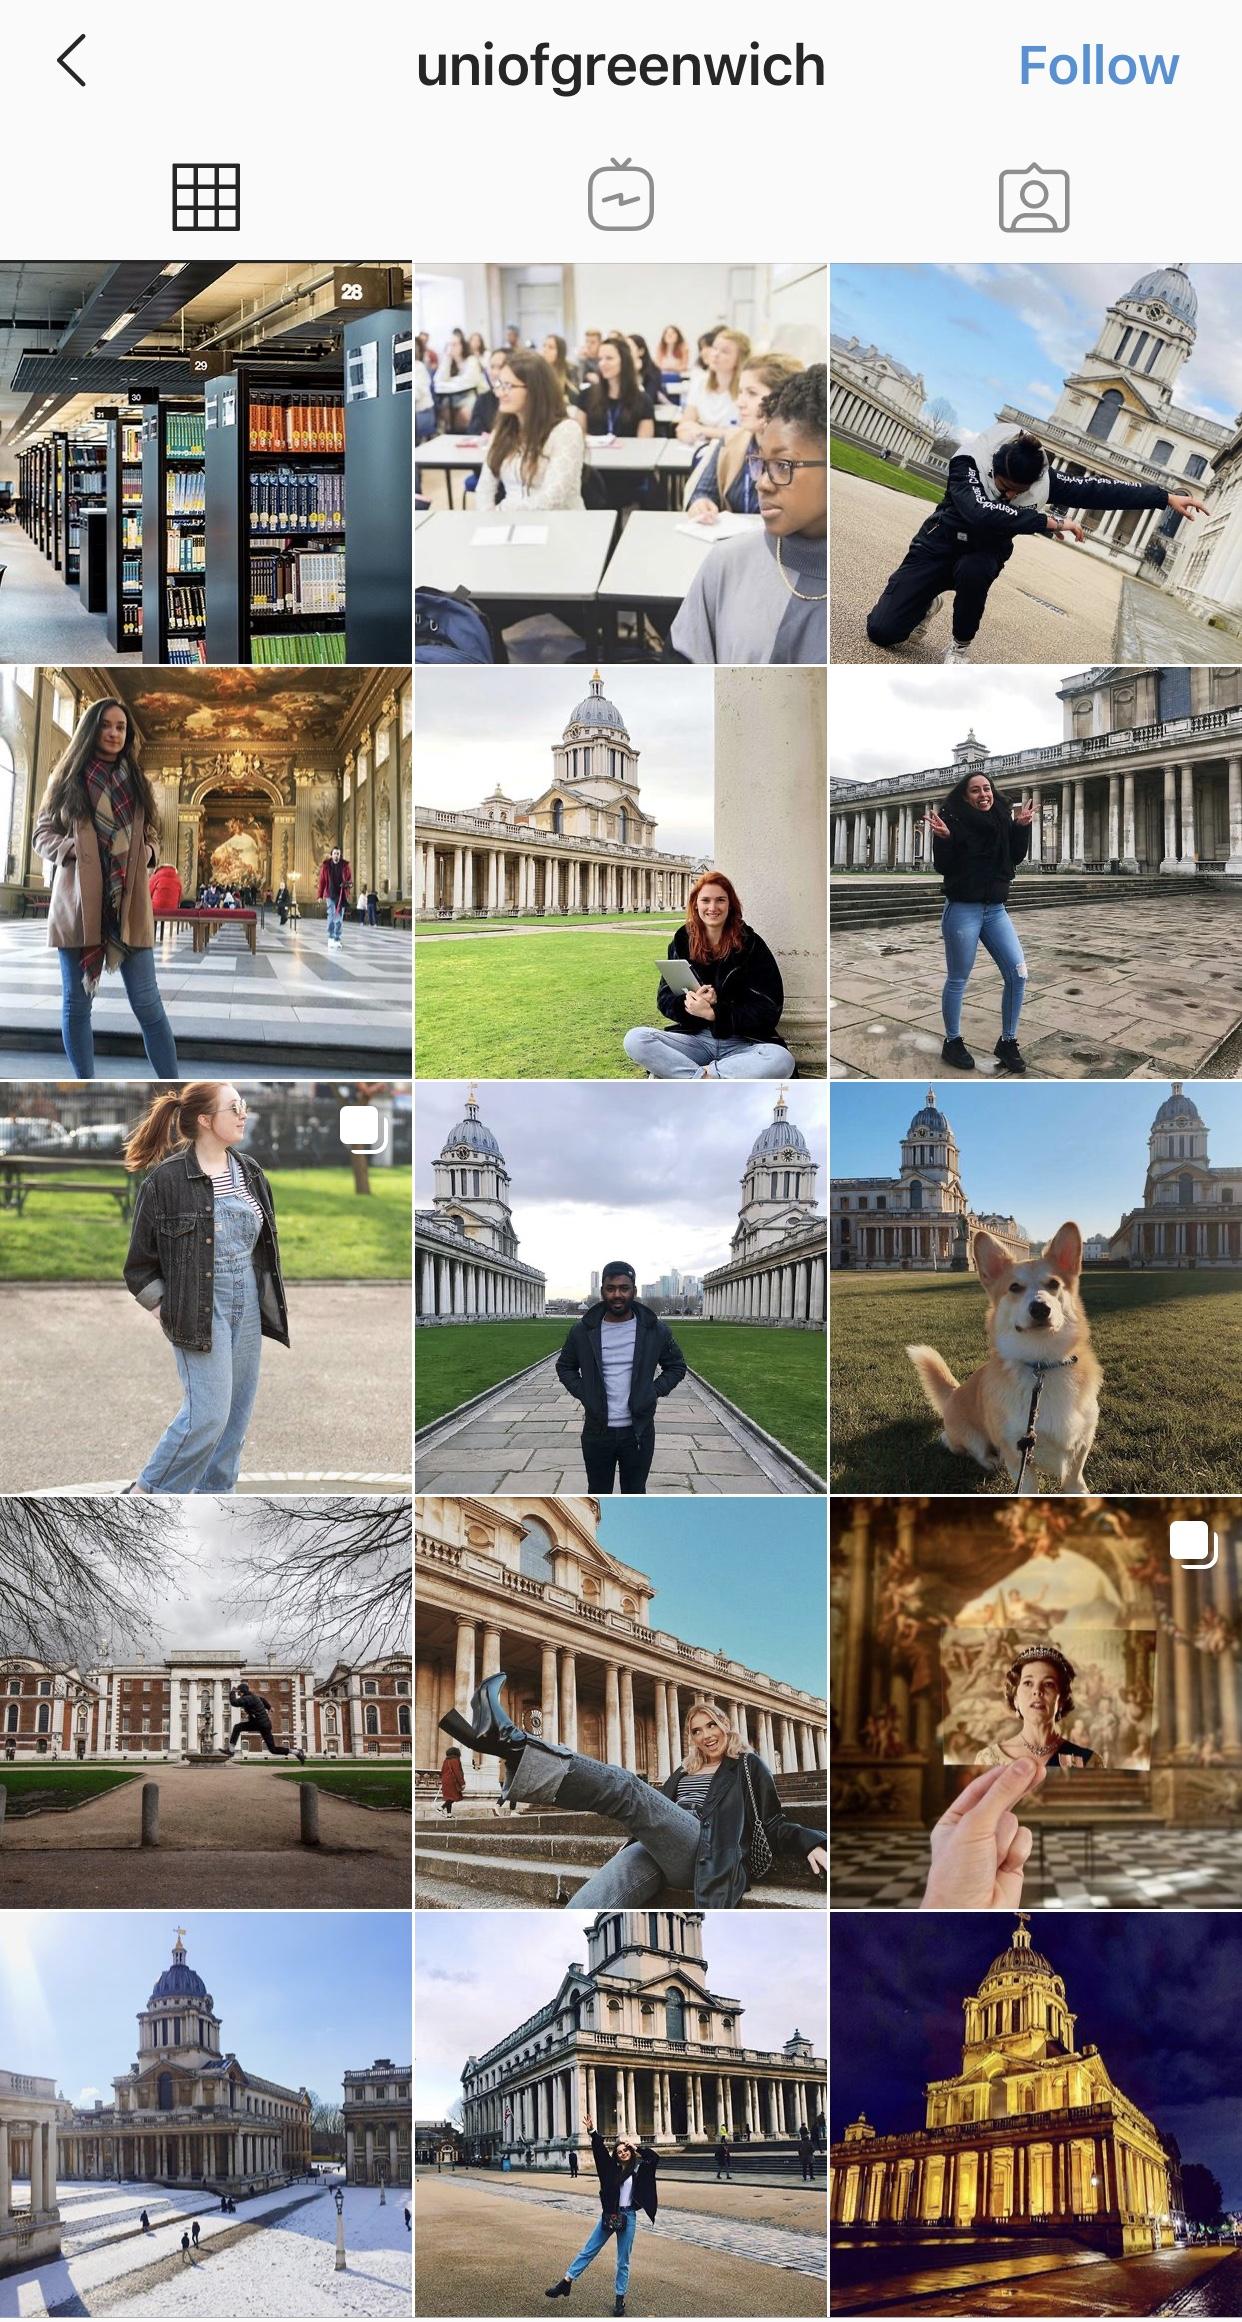 Greenwich-Uni-Instagram